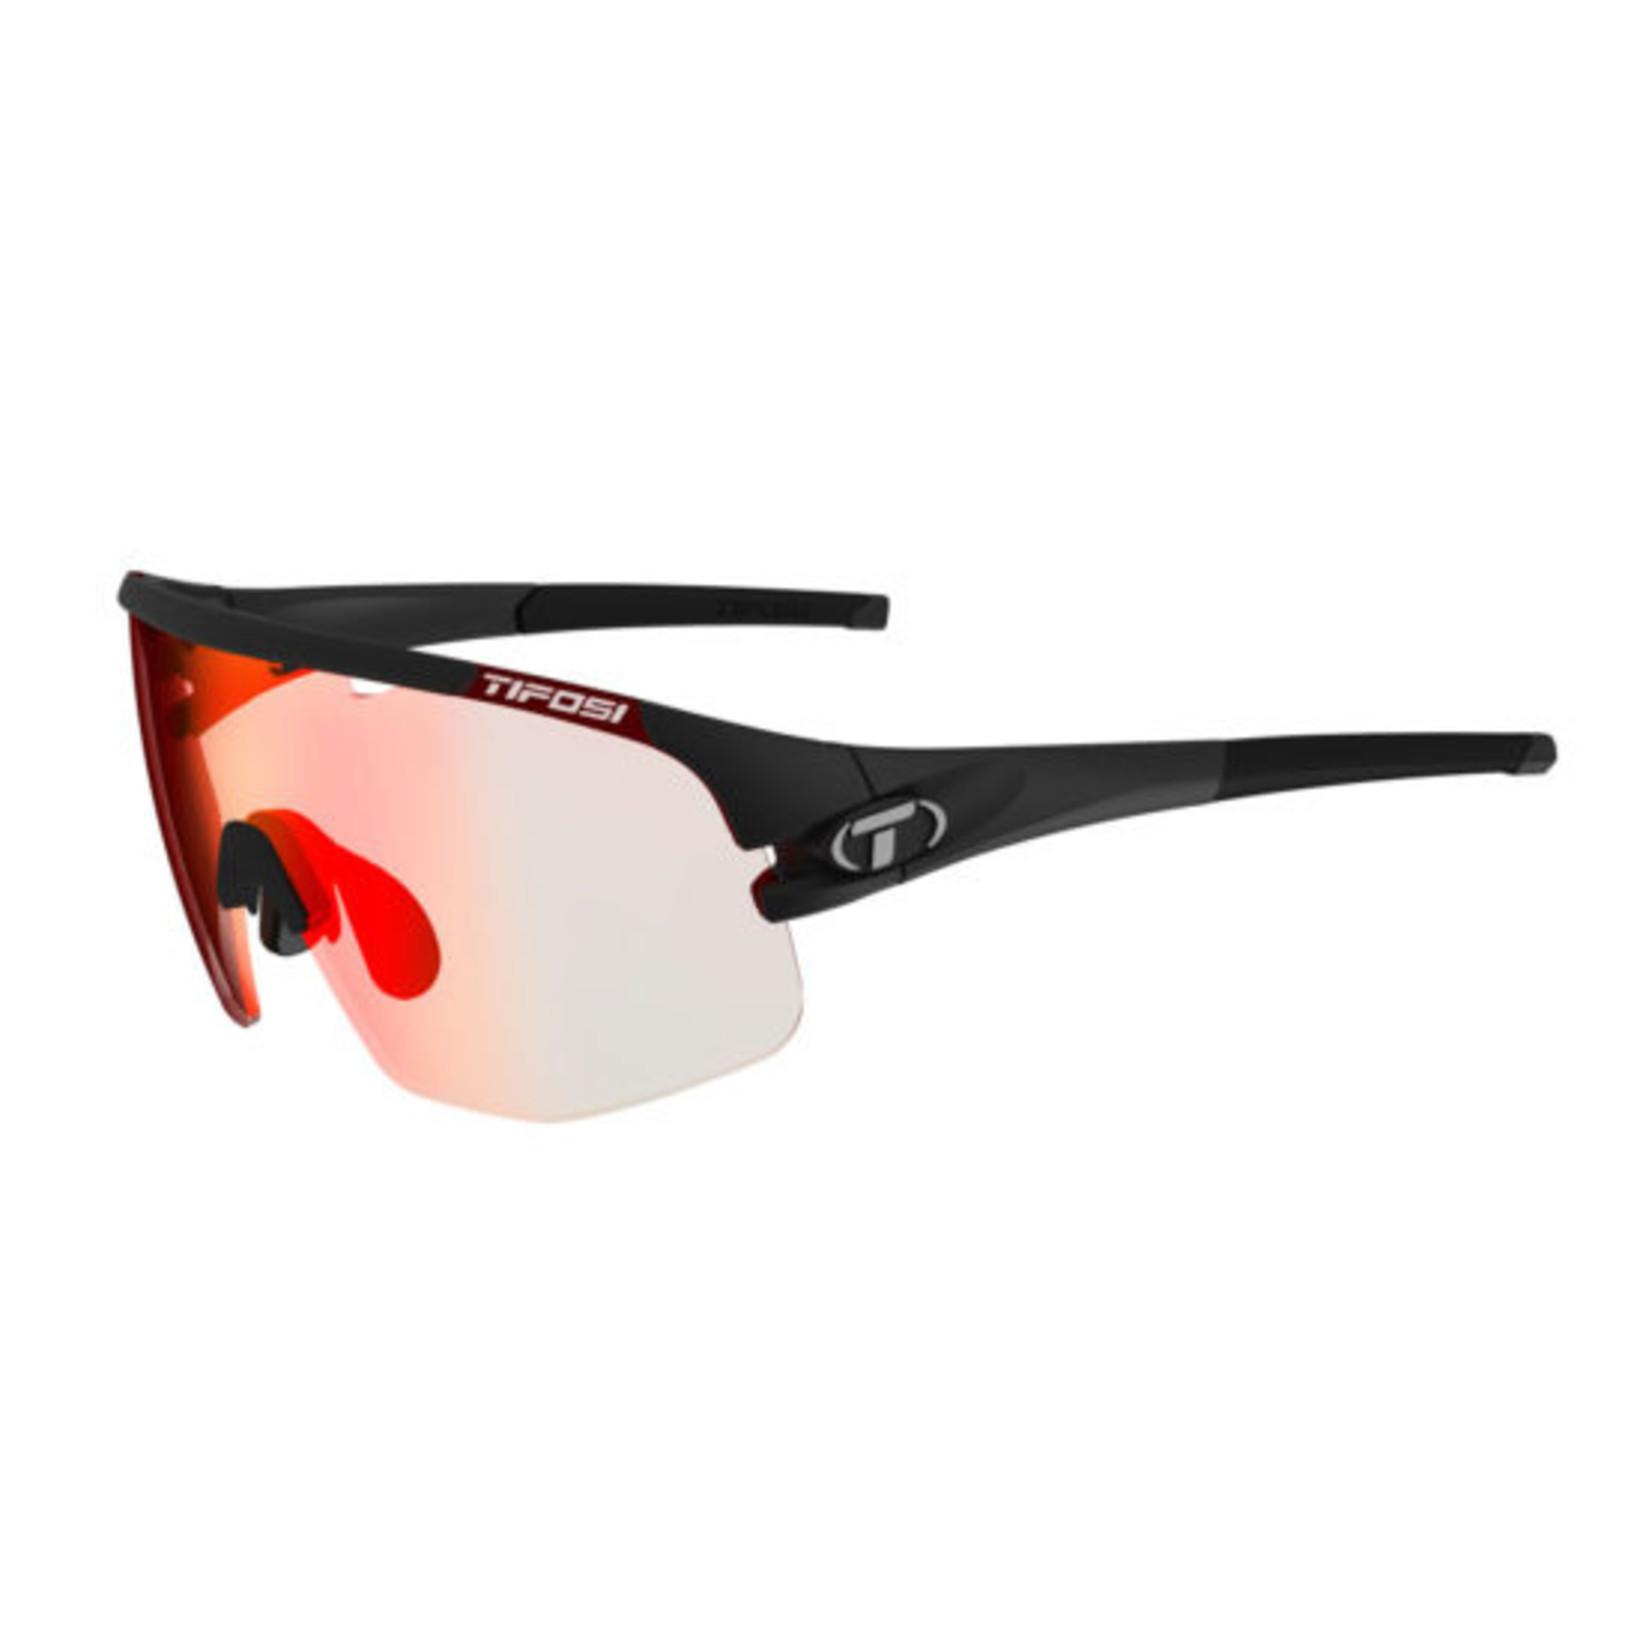 Tifosi Sledge Lite, Matte Black Fototec Sunglasses